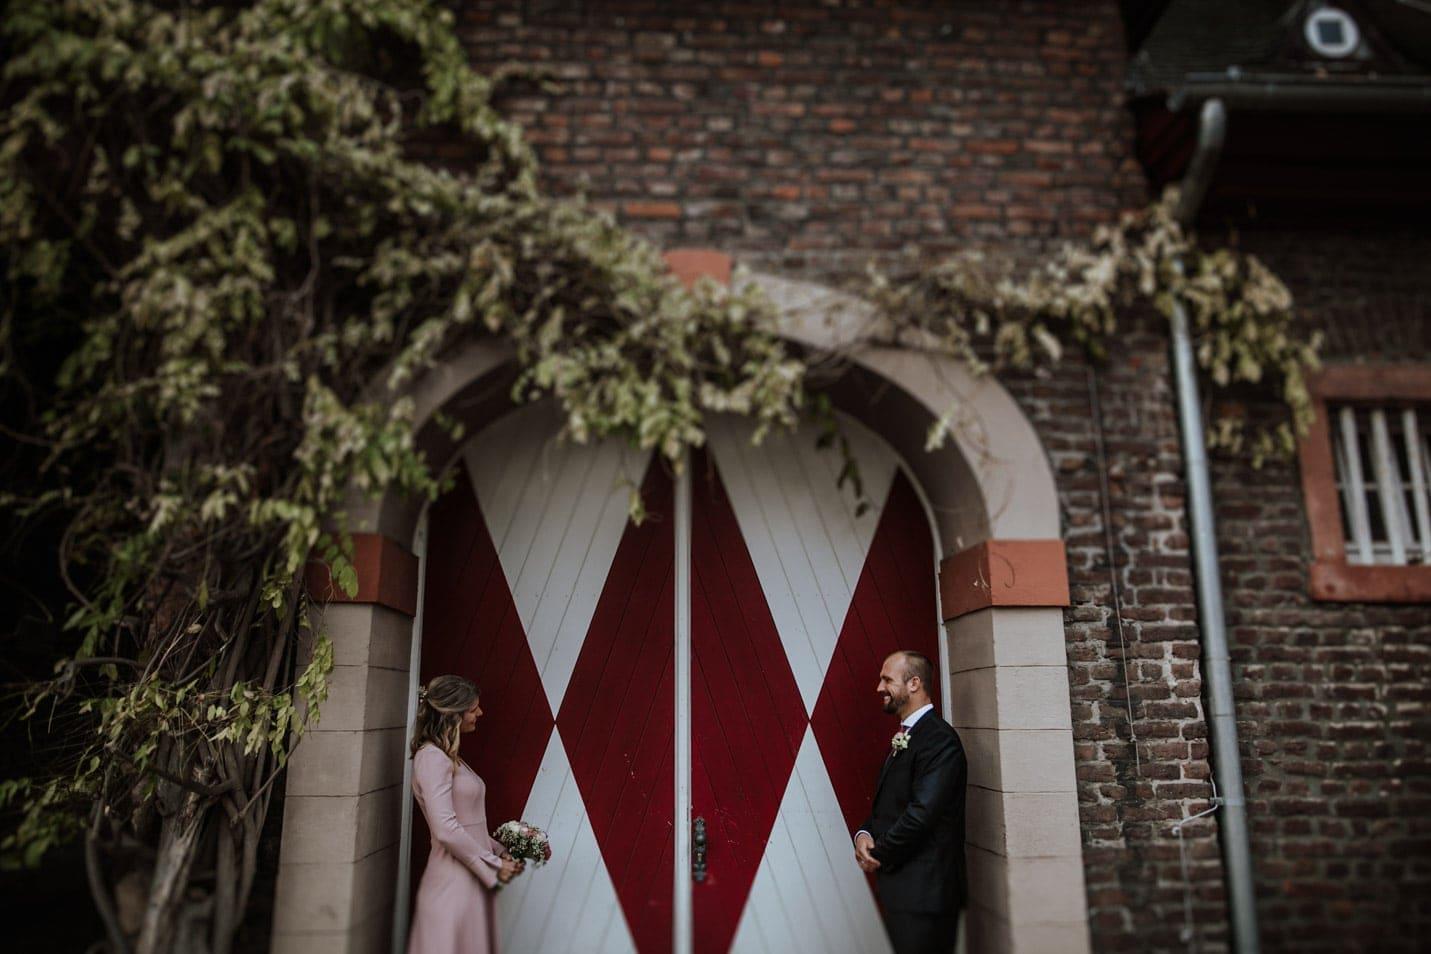 Brautpaarfotoshooting in Schloss Wahn Köln